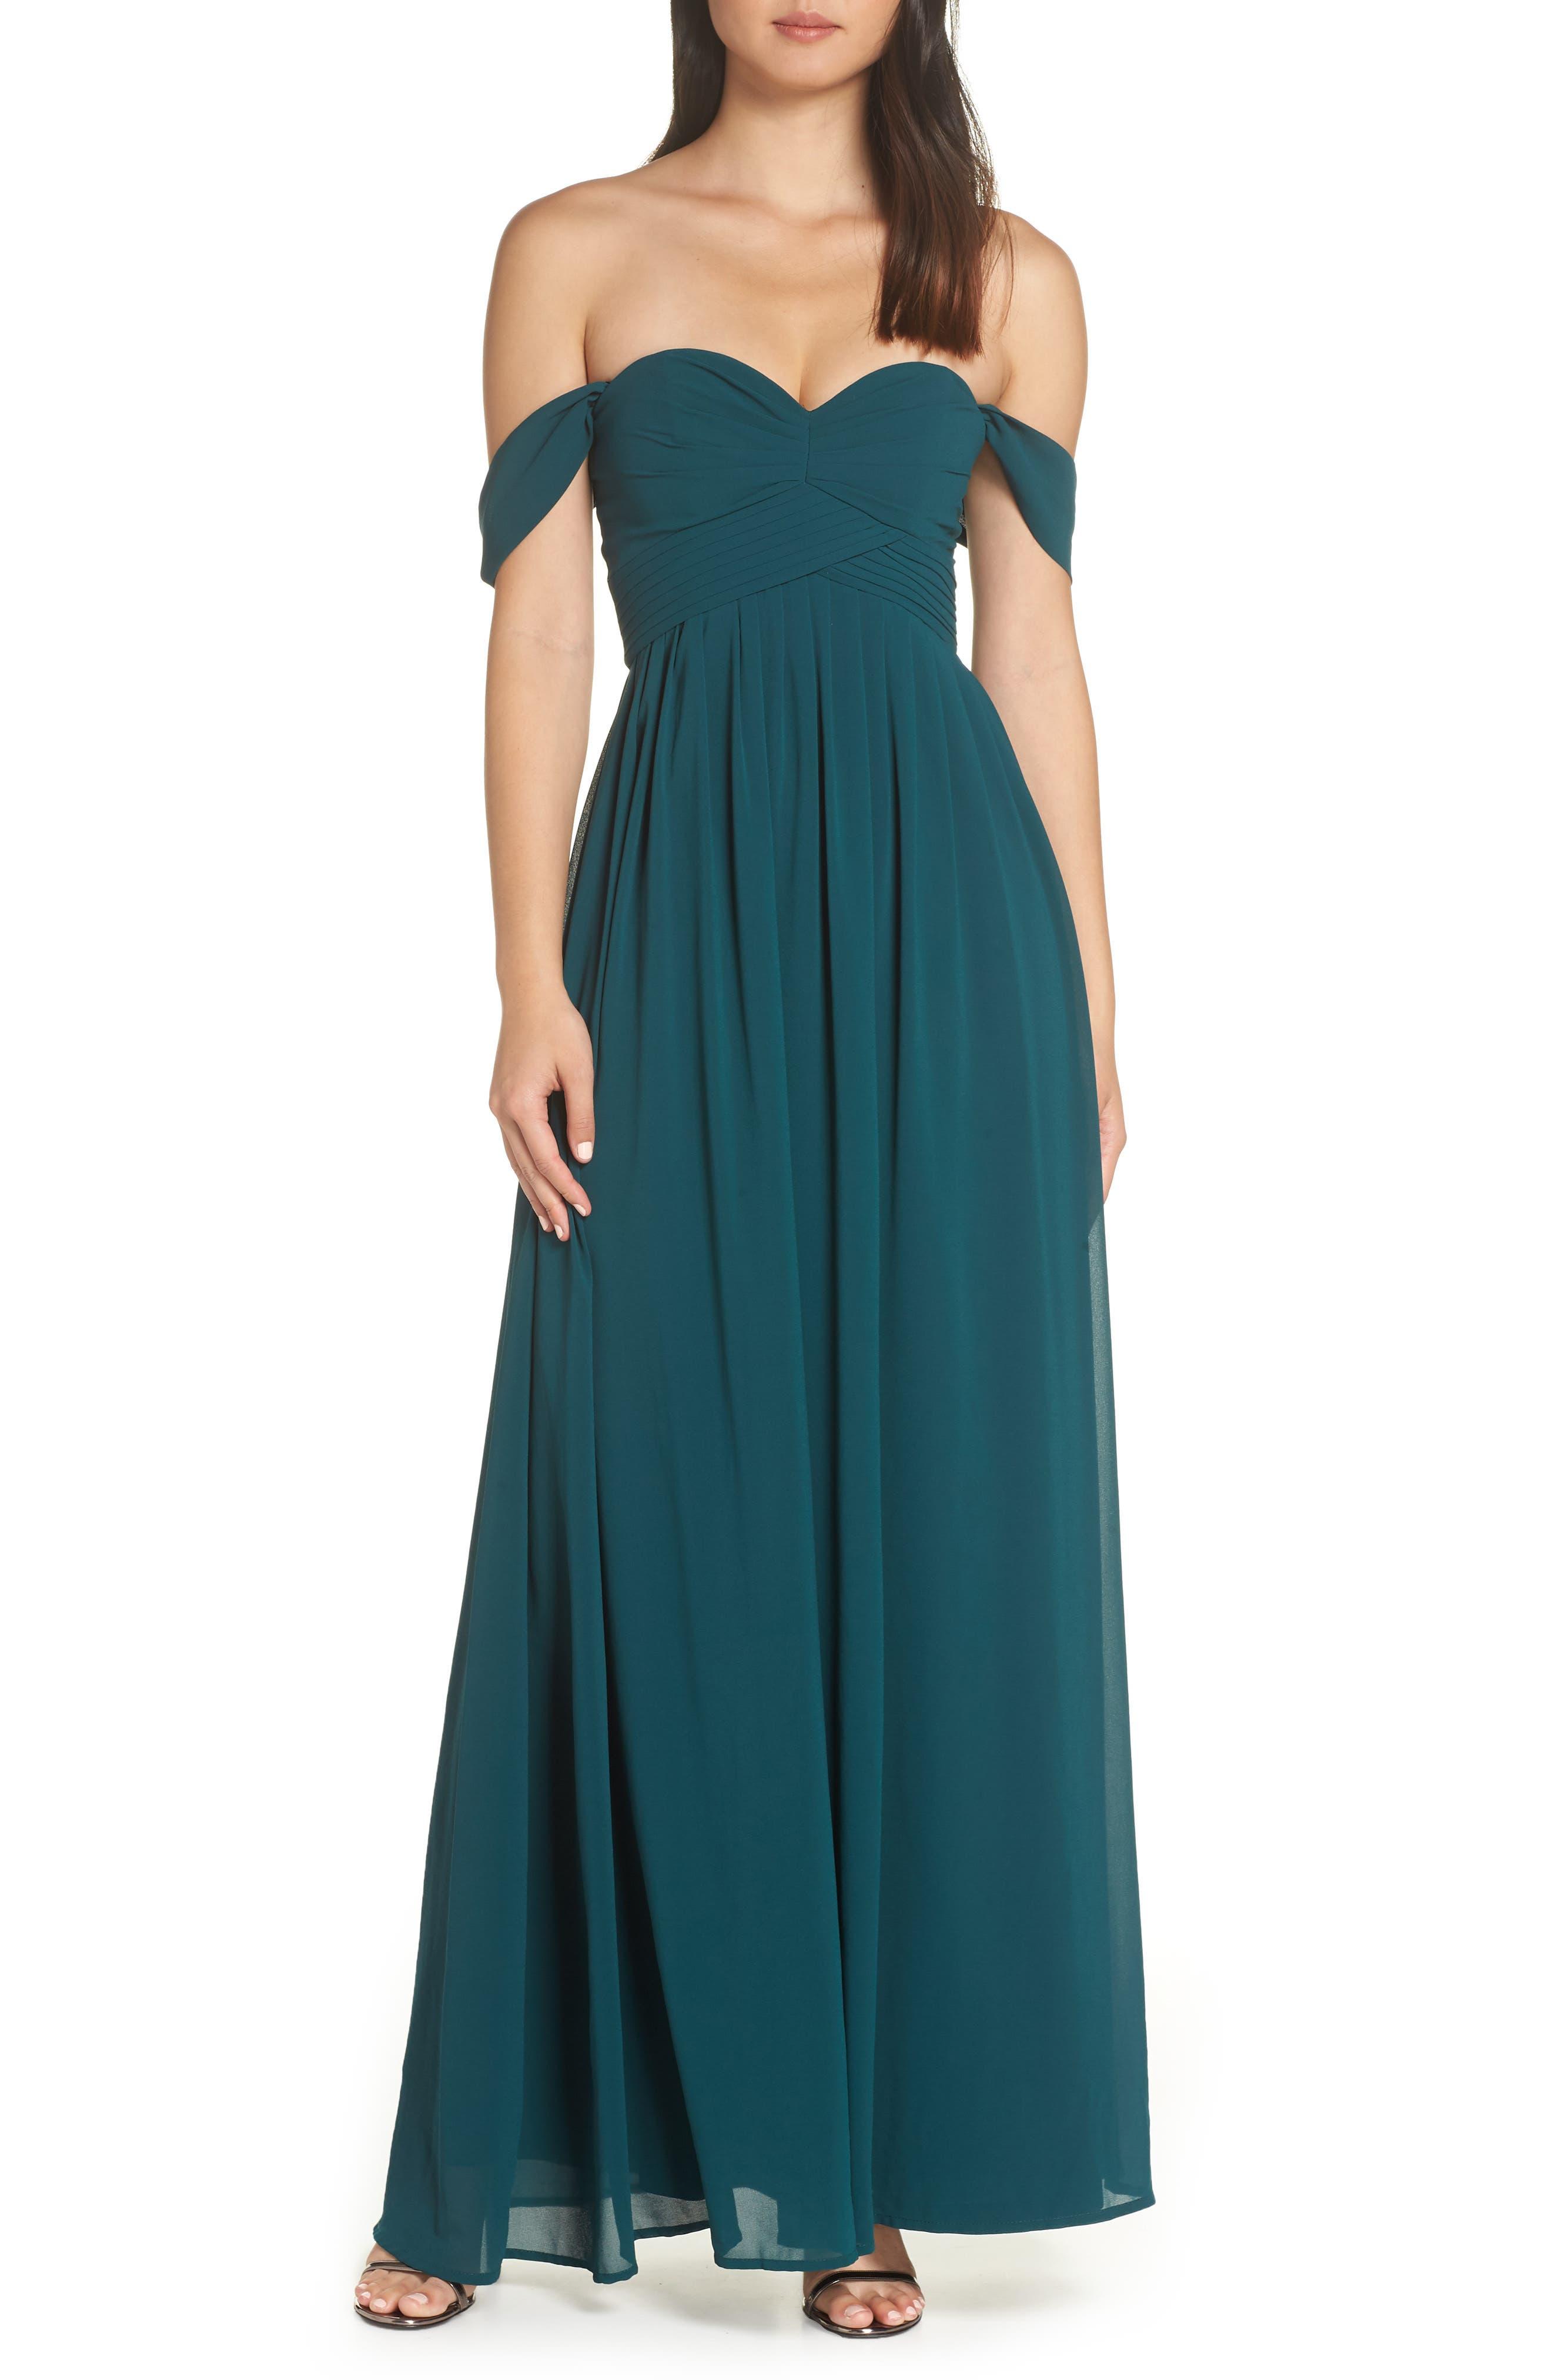 LULUS Convertible Neckline Chiffon Gown, Main, color, DEEP EMERALD